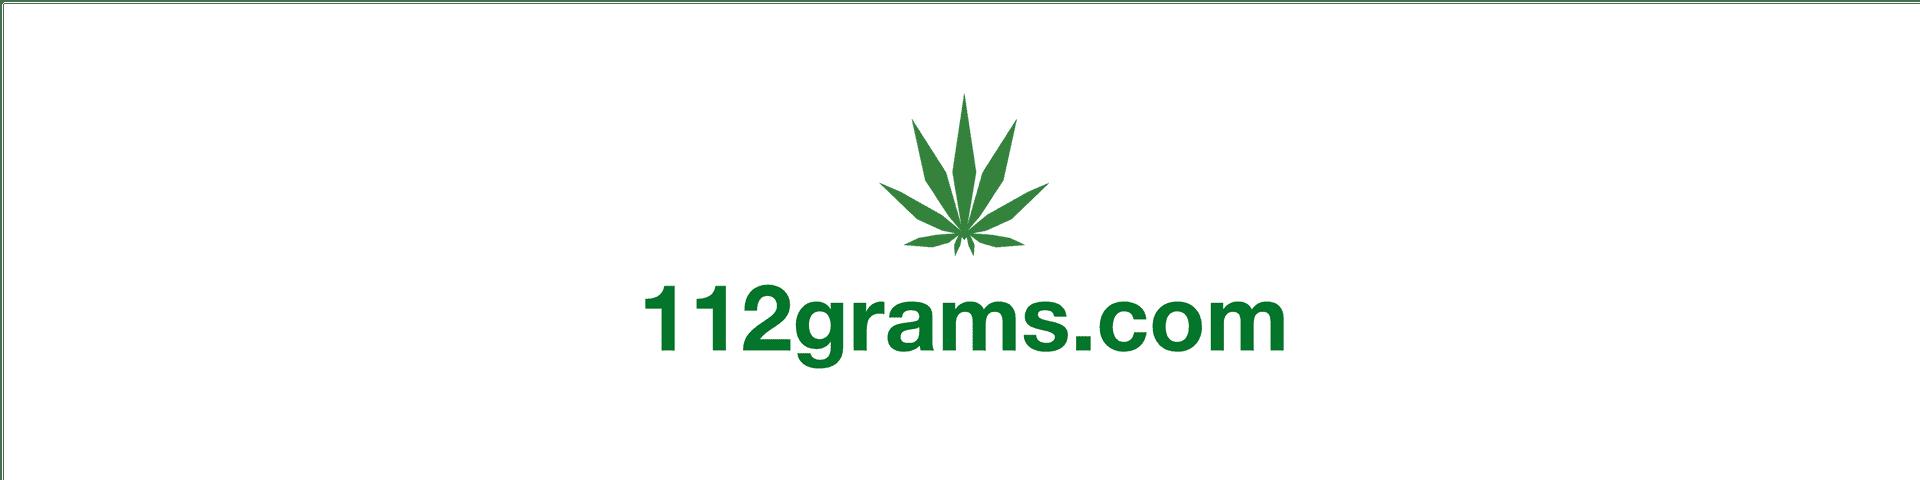 112grams logo